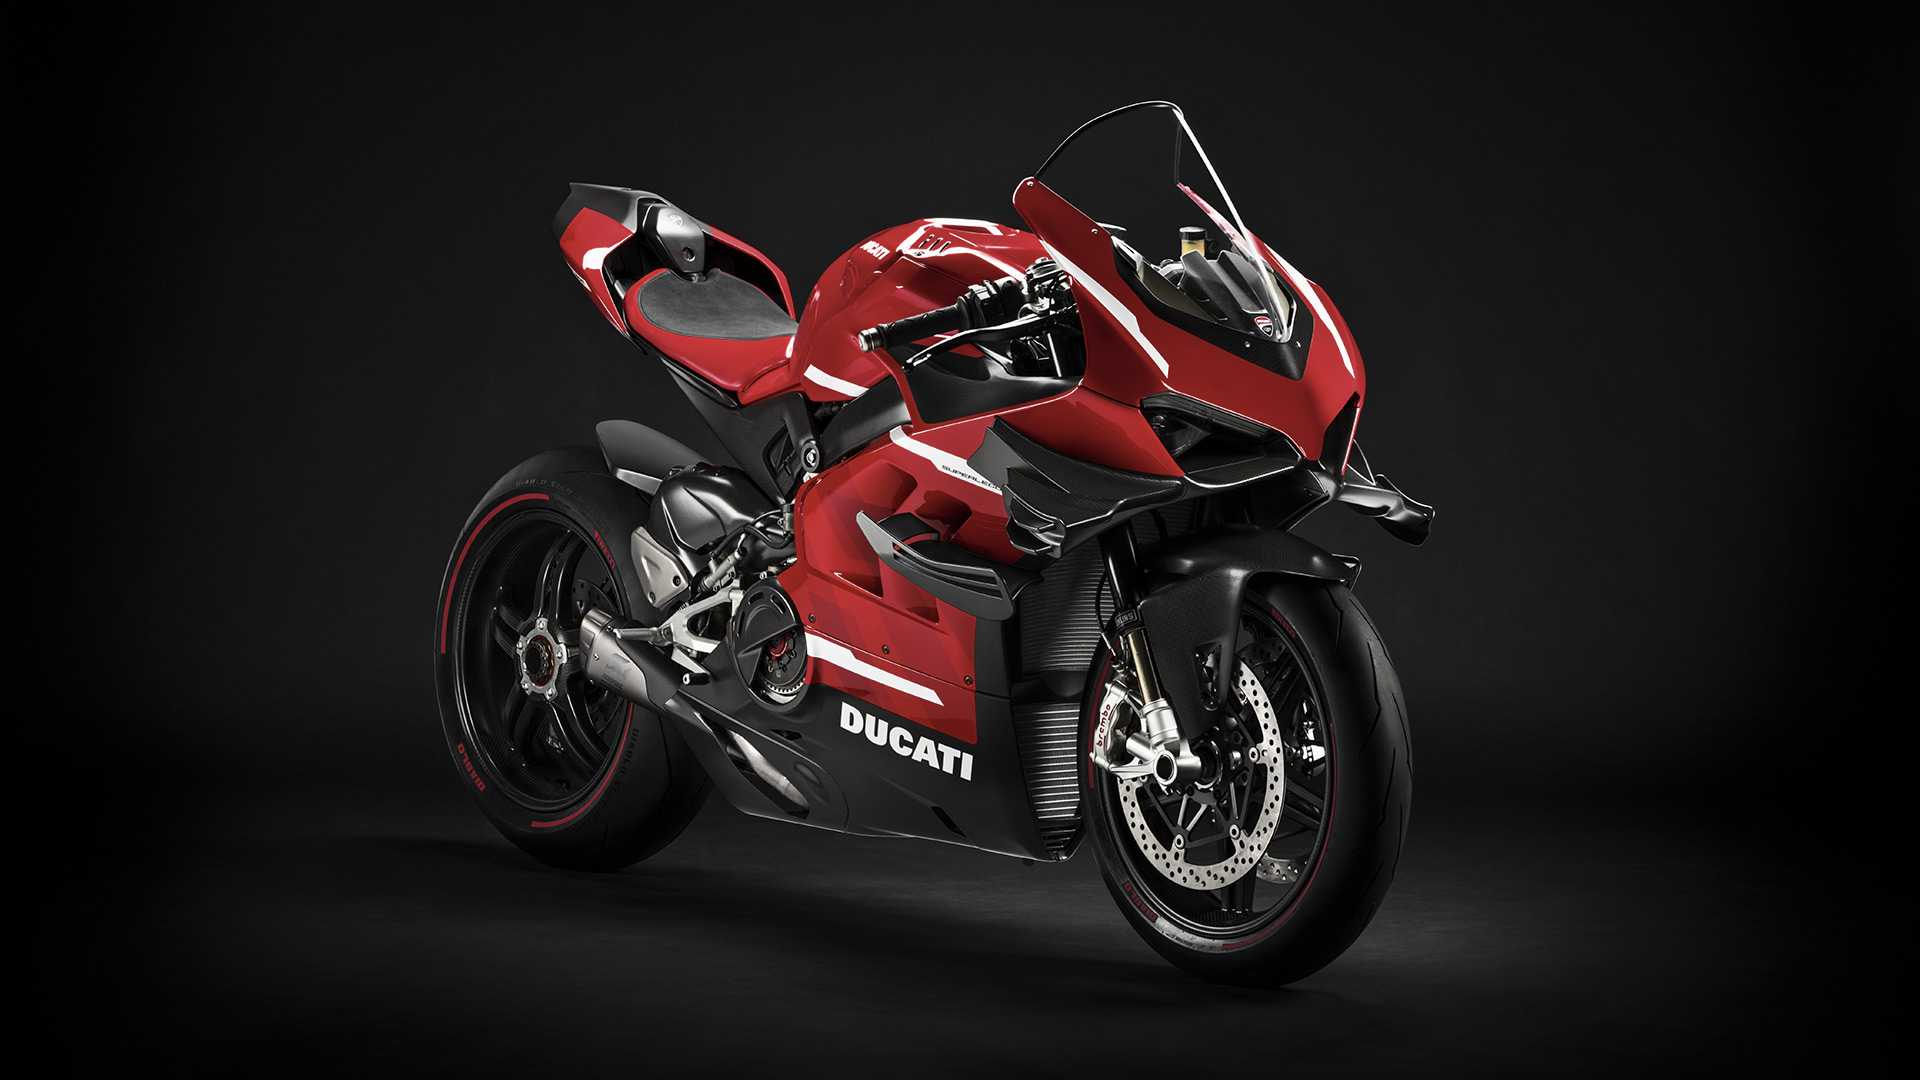 2020 Ducati Panigale V4 Superleggera